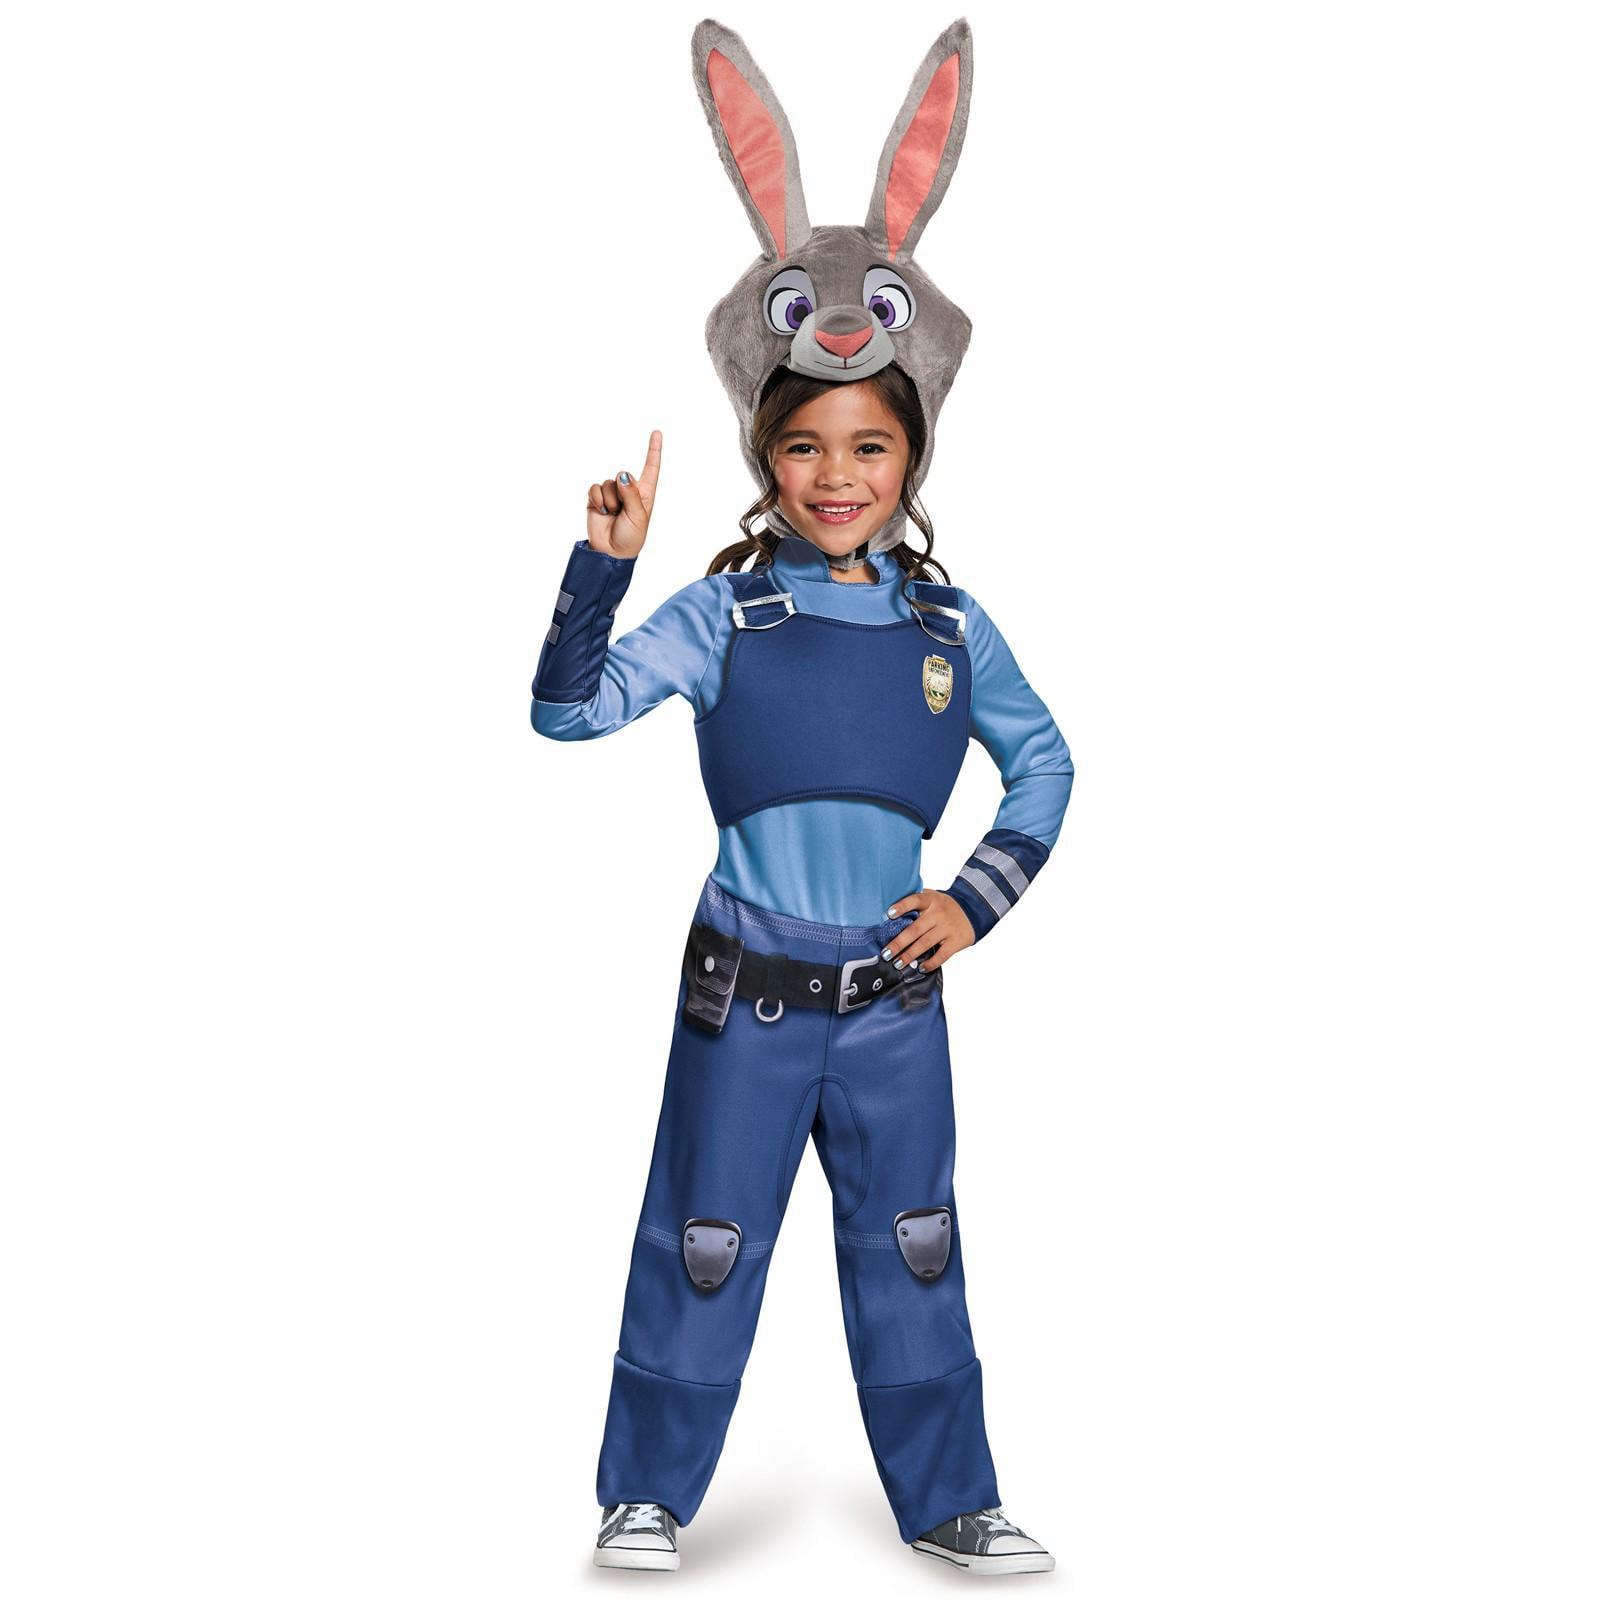 sc 1 st  Walmart.com & Zootopia Judy Hopps Classic Toddler Costume 3-4T - Walmart.com